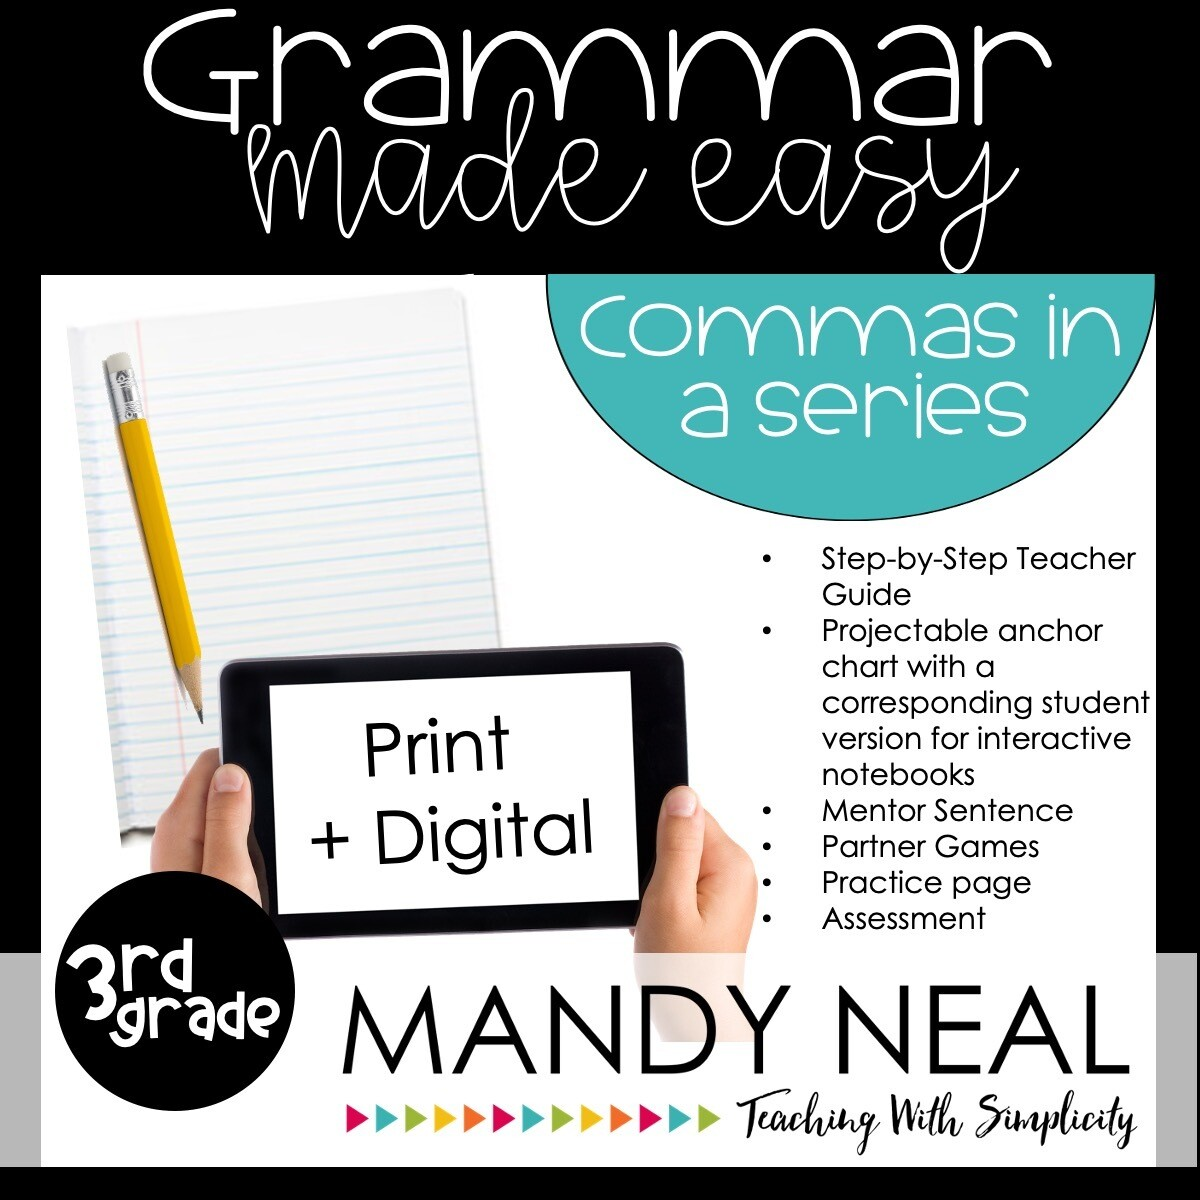 Print + Digital Third Grade Grammar Activities (Commas in a Series)